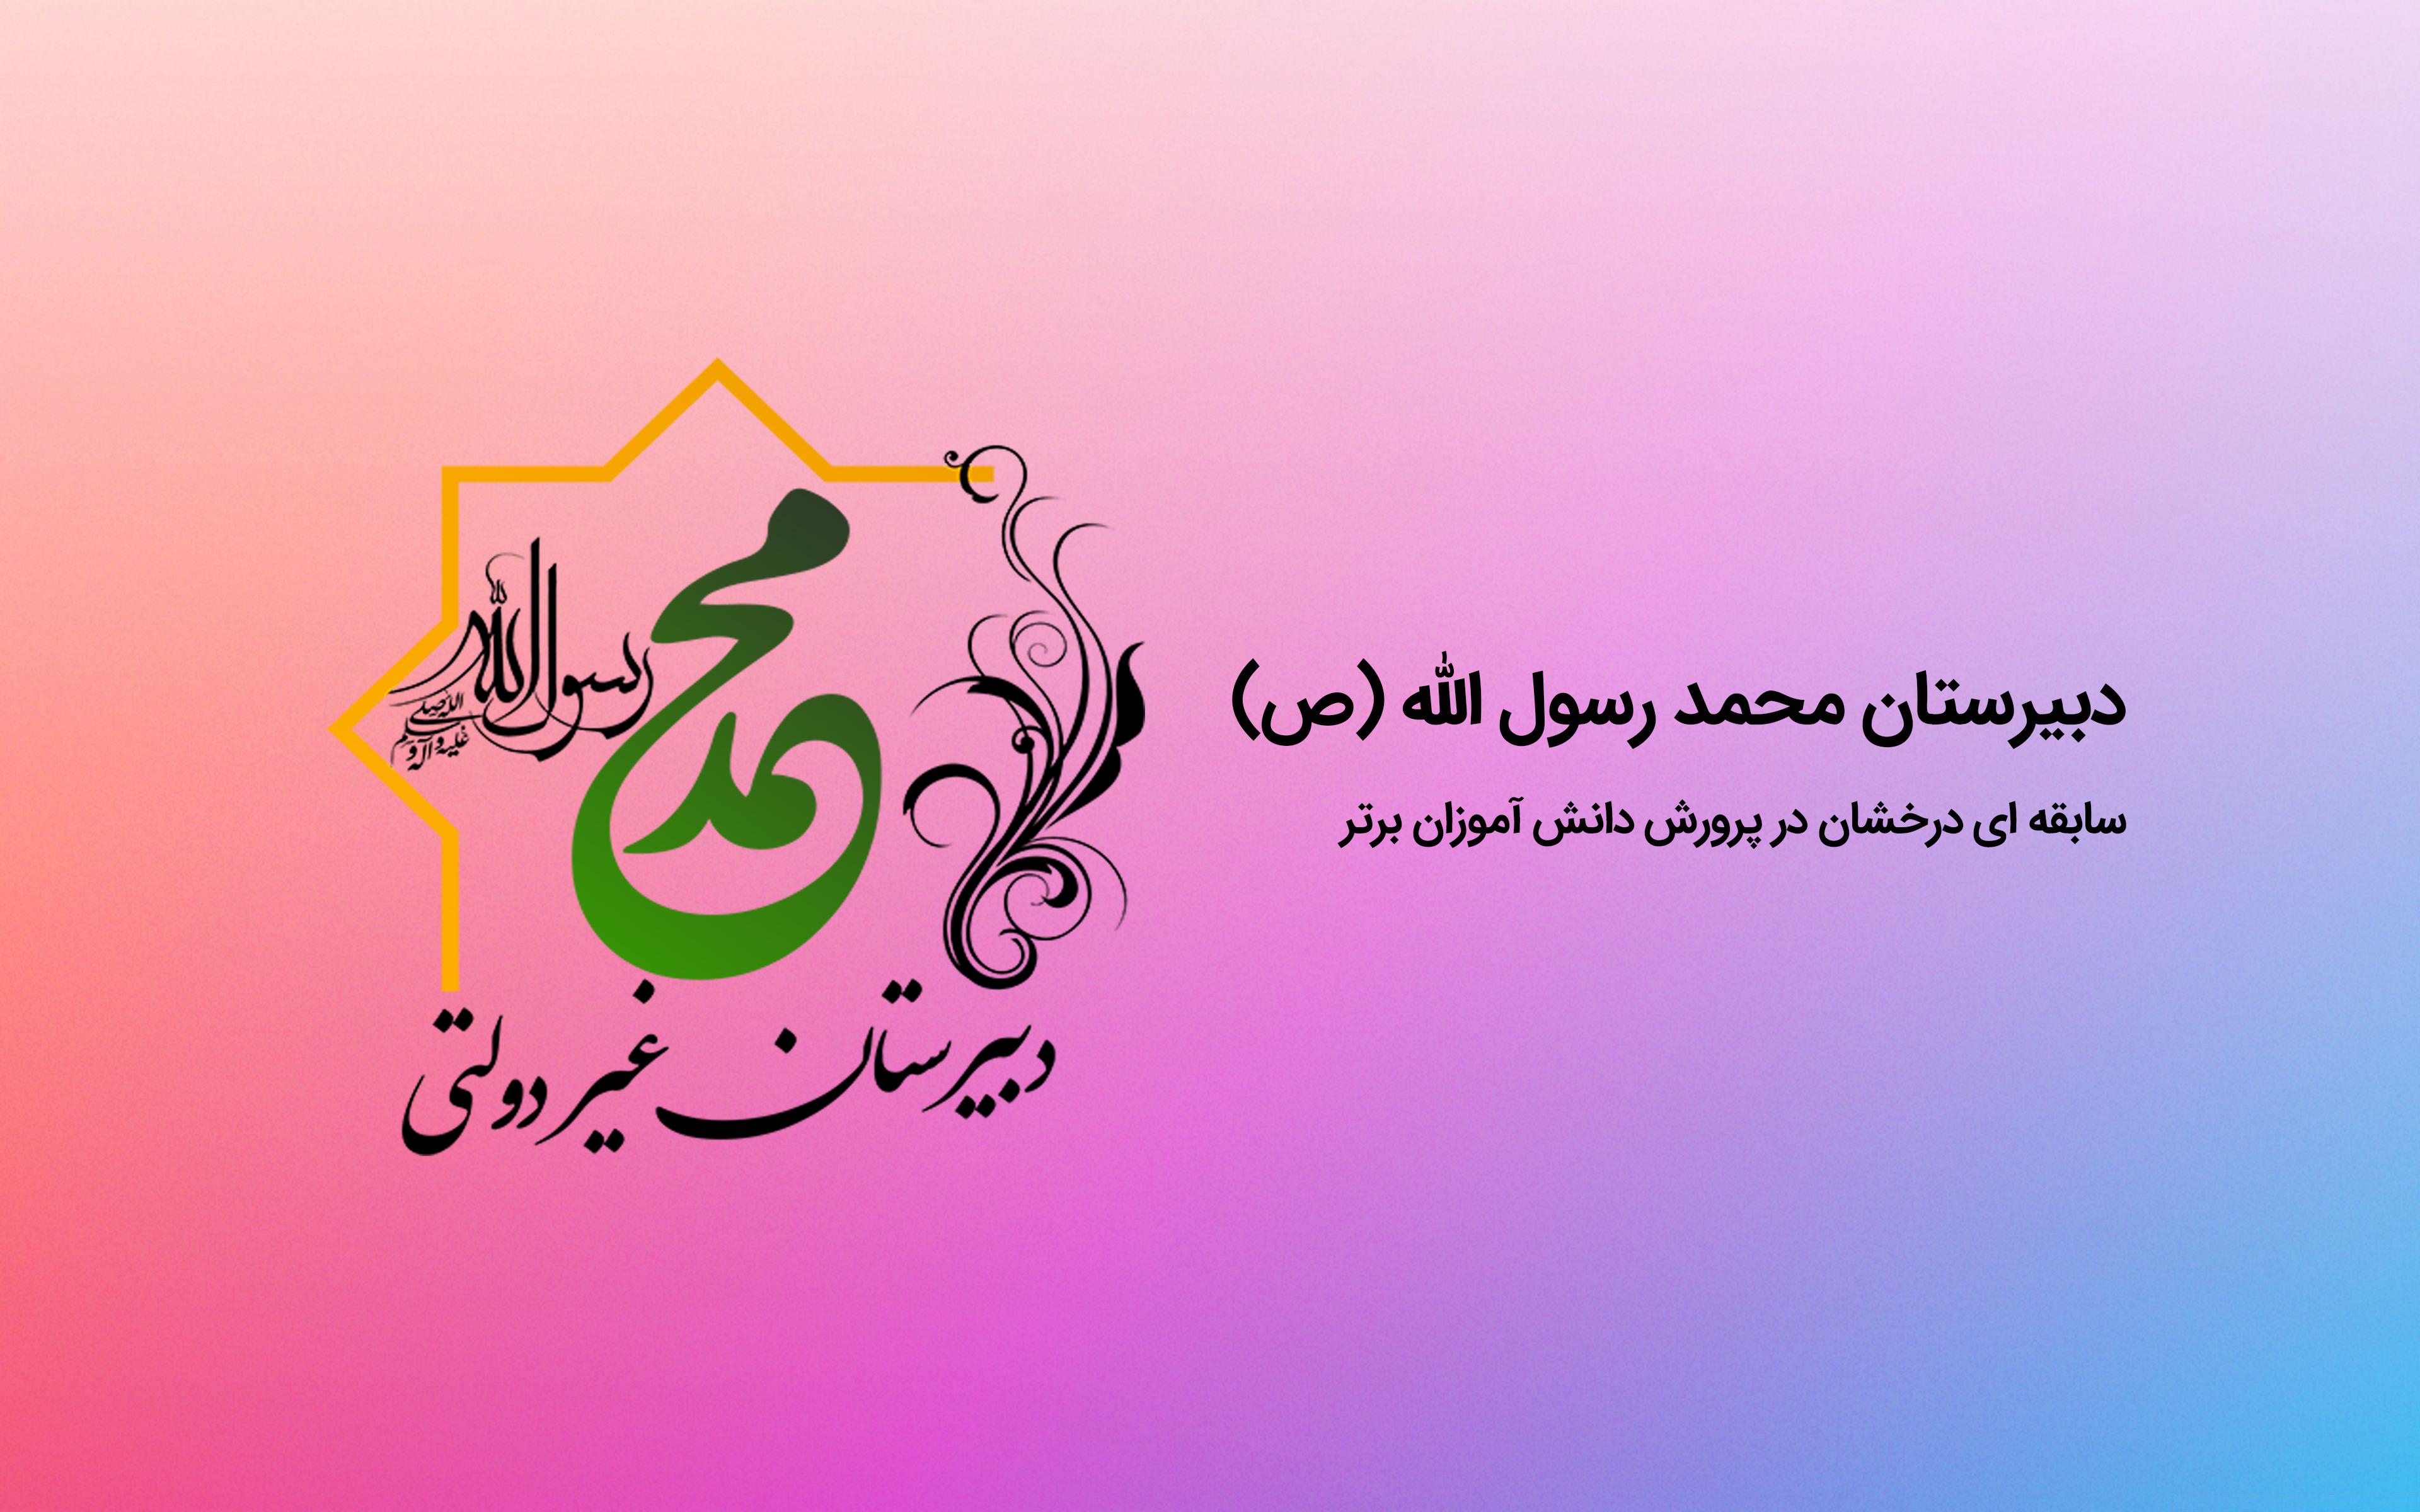 دبیرستان غیردولتی محمد رسول الله (ص)